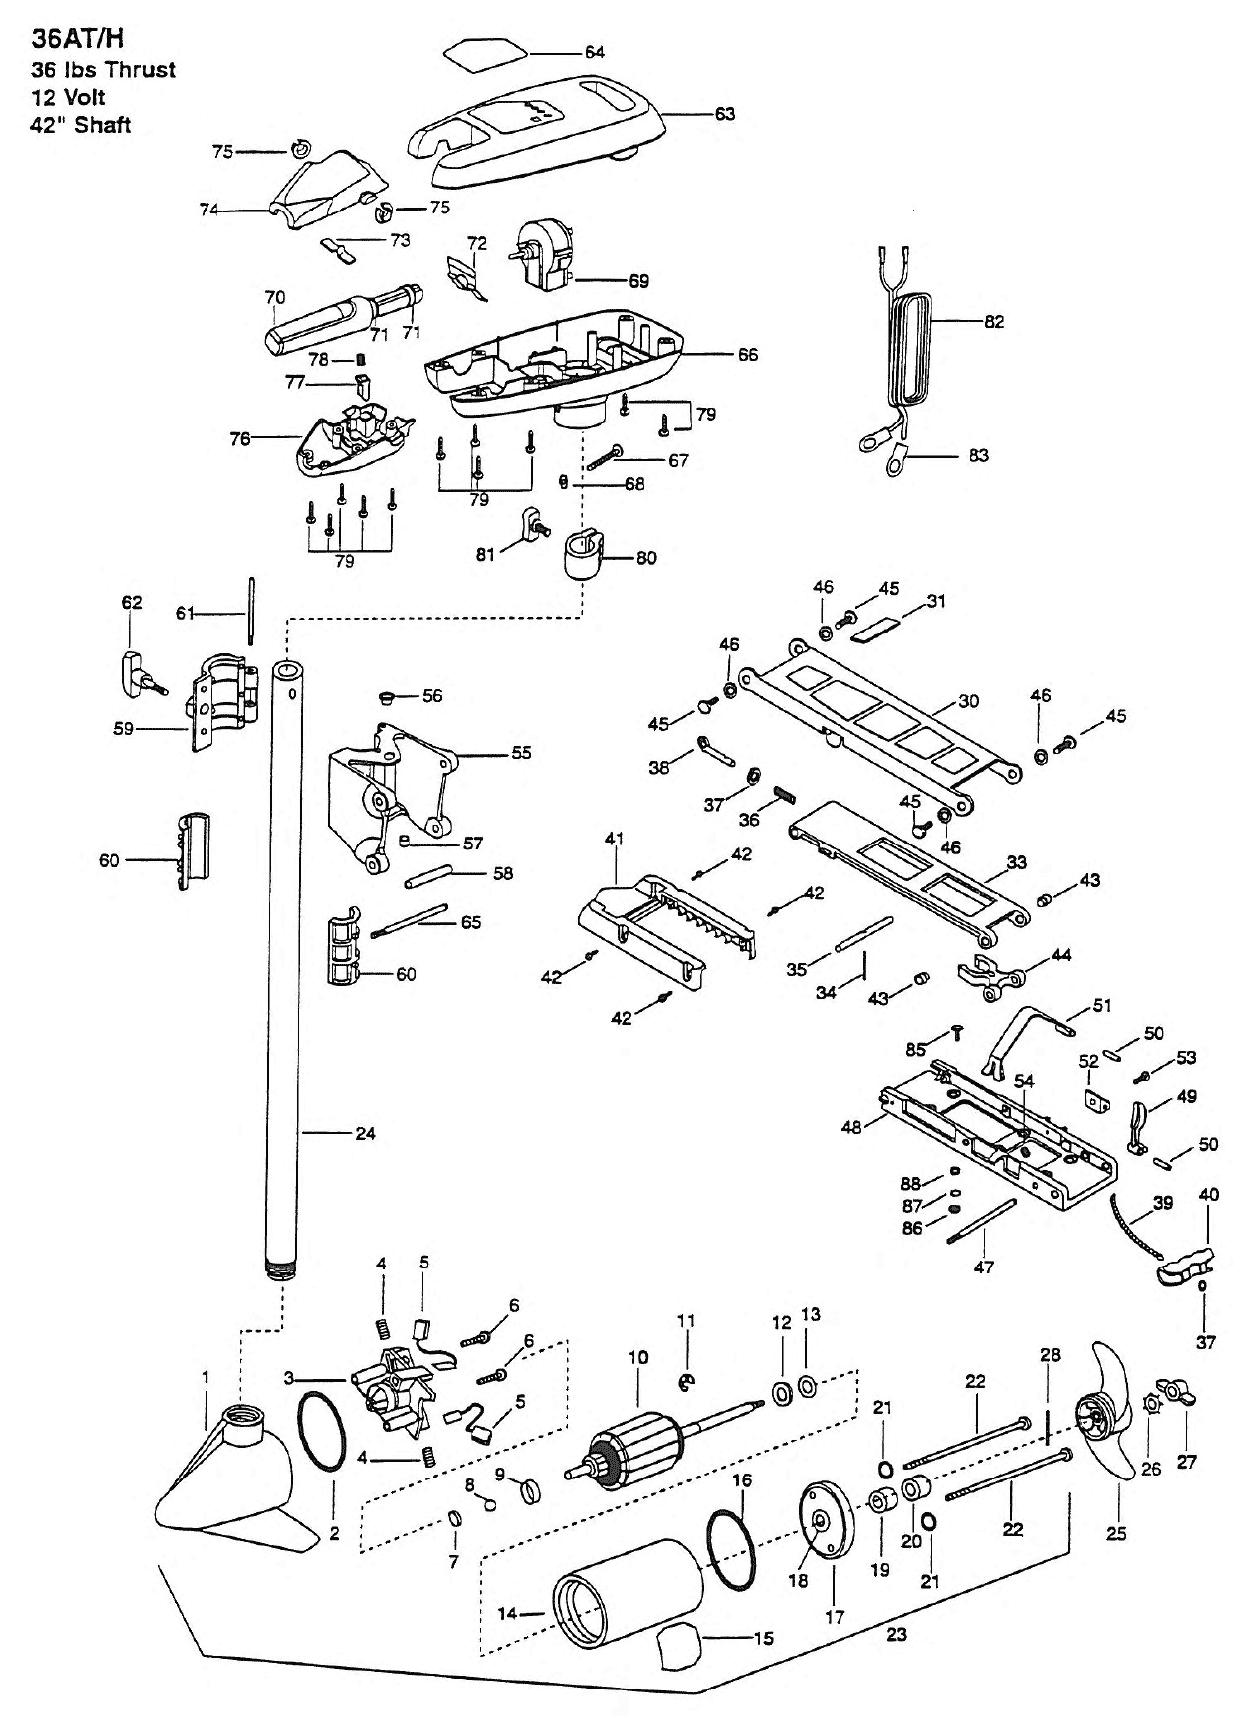 Minn Kota 85 Wiring Diagram Page 4 And Schematics 12 Volt Diagrams Rh Quizzable Co 12v Schematic